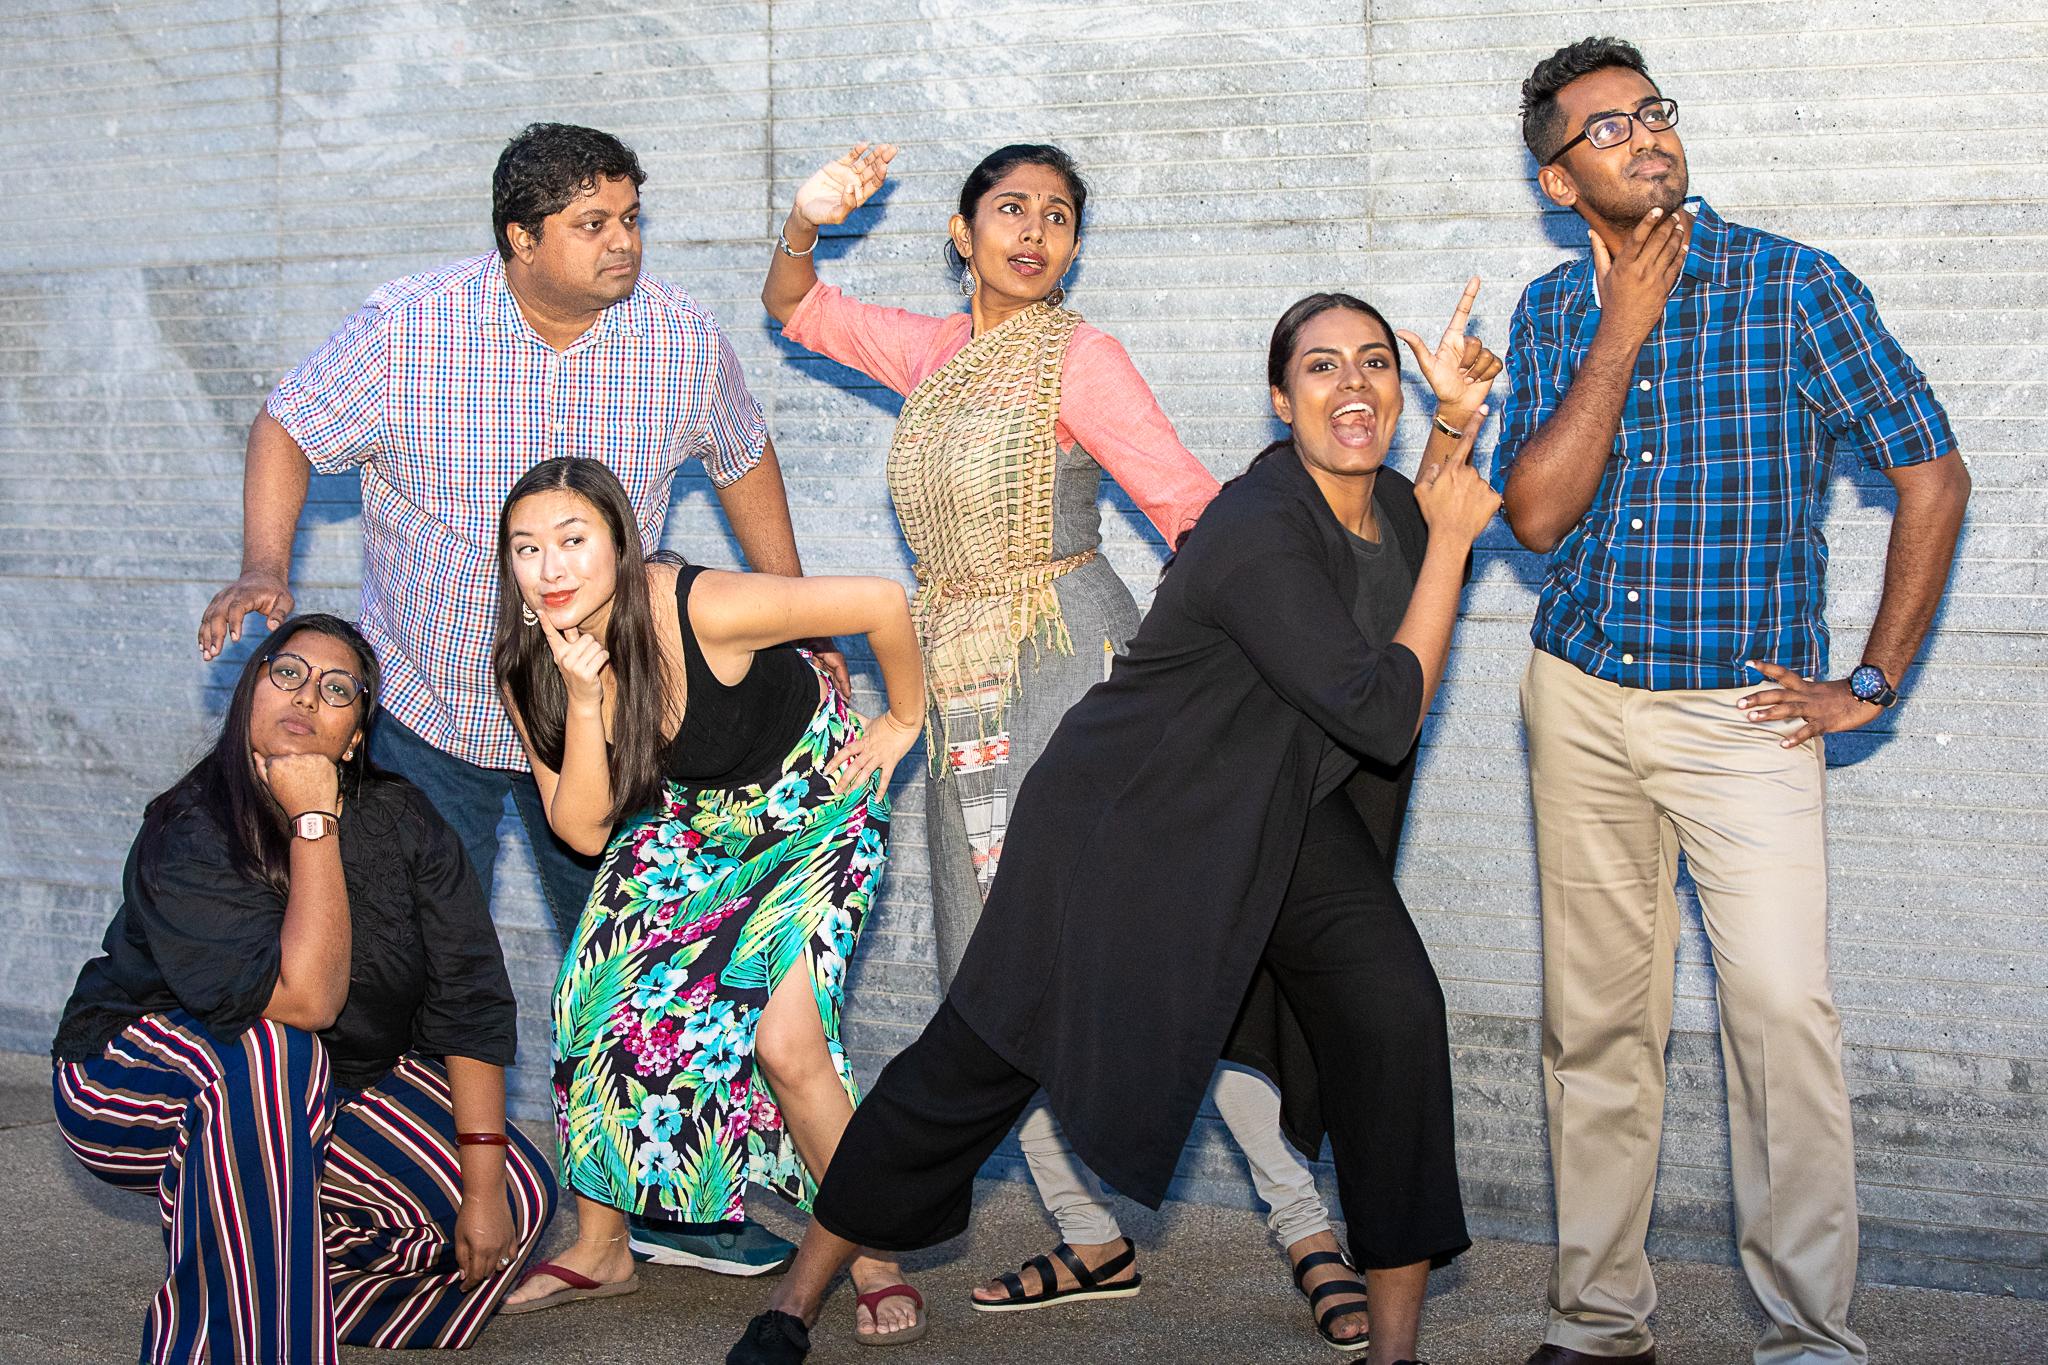 Puraan Residences (L to R) Pramila Pam, Hemang Yadav (director), Gillian Tan, Aiswarya Nair, Rebekah Sangeetha Dorai, Md Amin Md